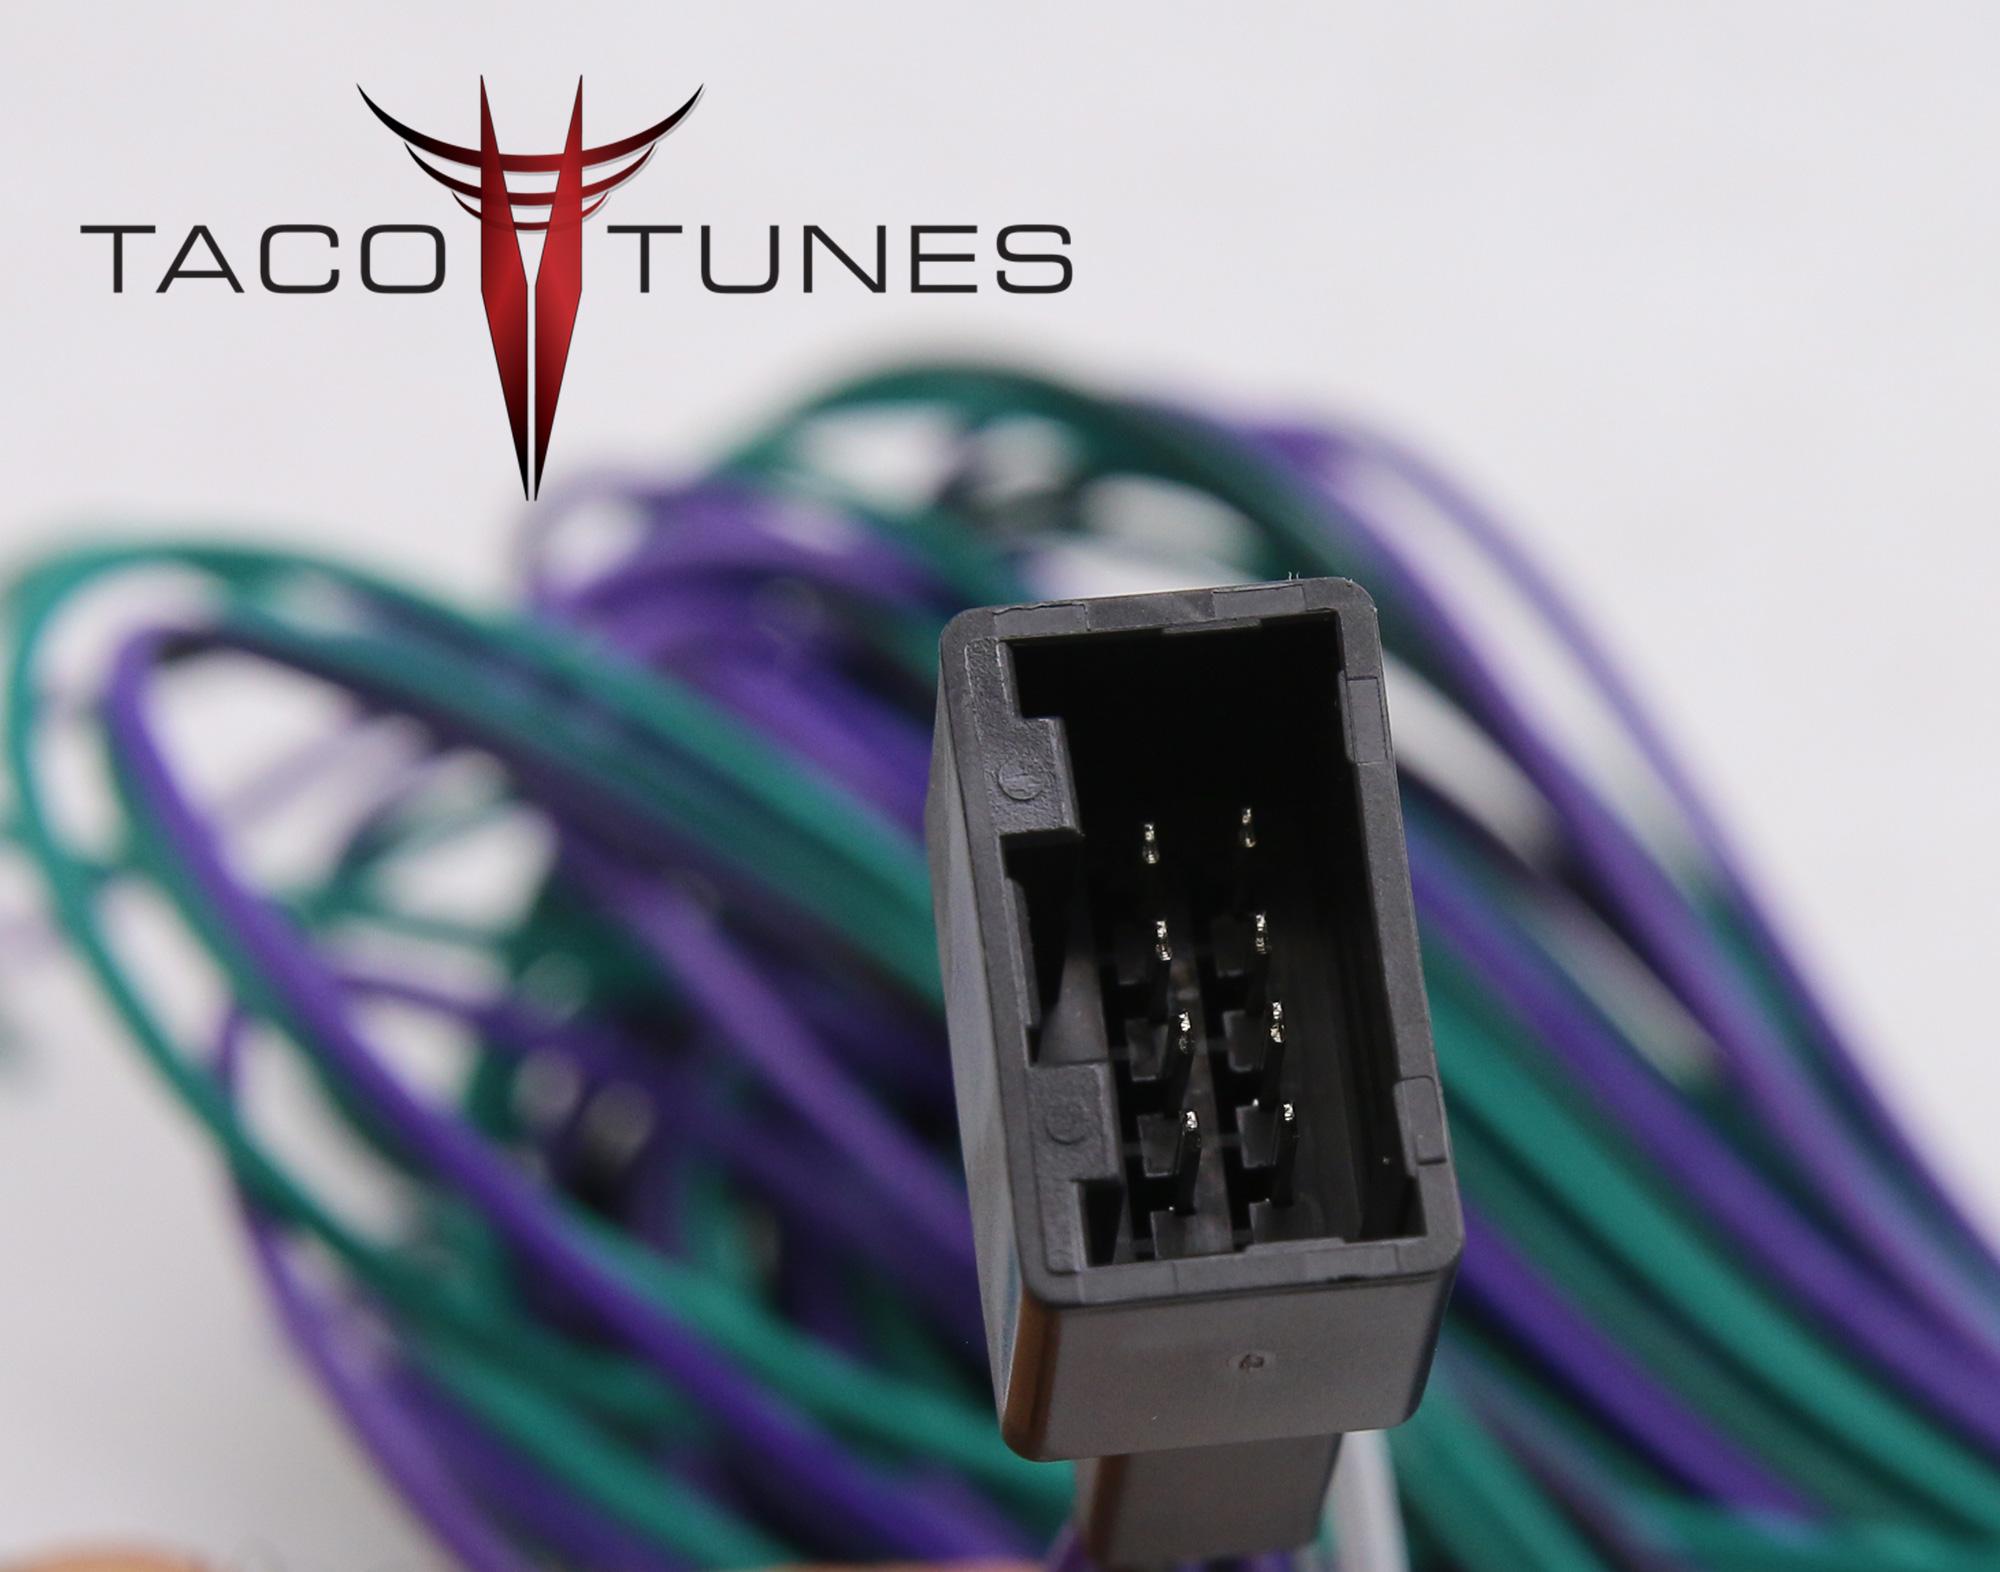 Toyota Camry Radio Wiring Harness from tacotunes.com